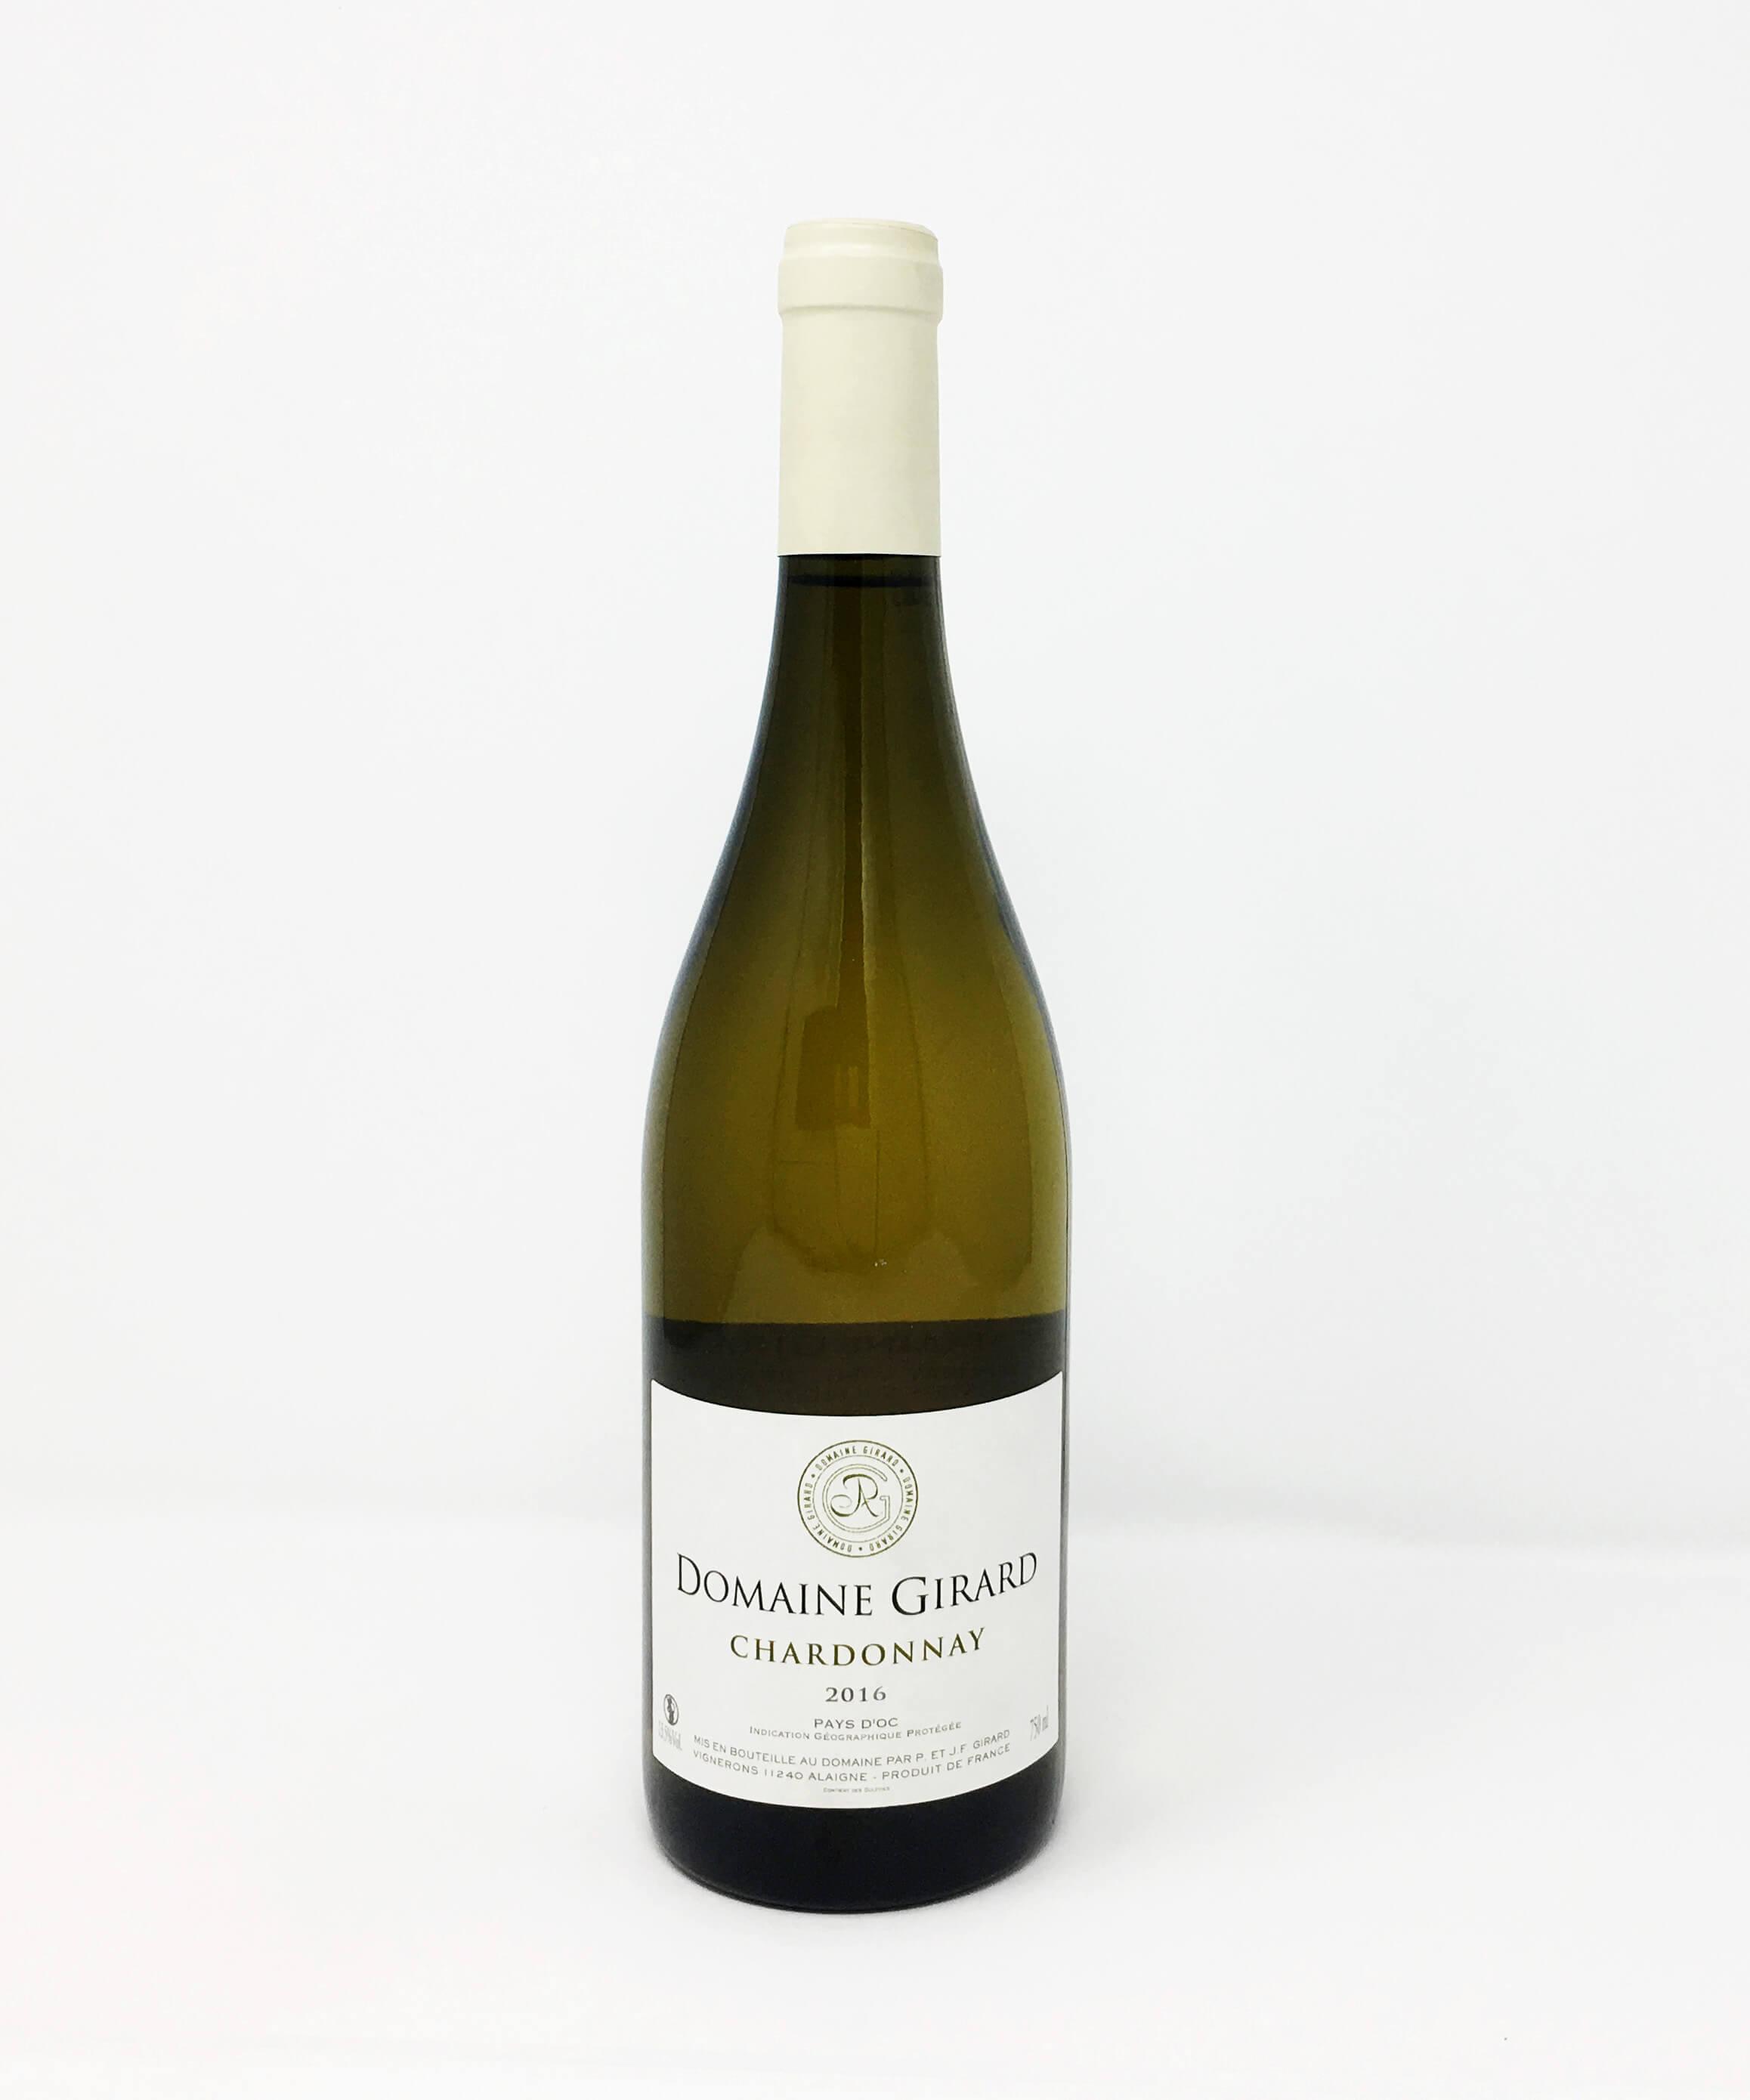 Domaine Girard, Chardonnay, Classique